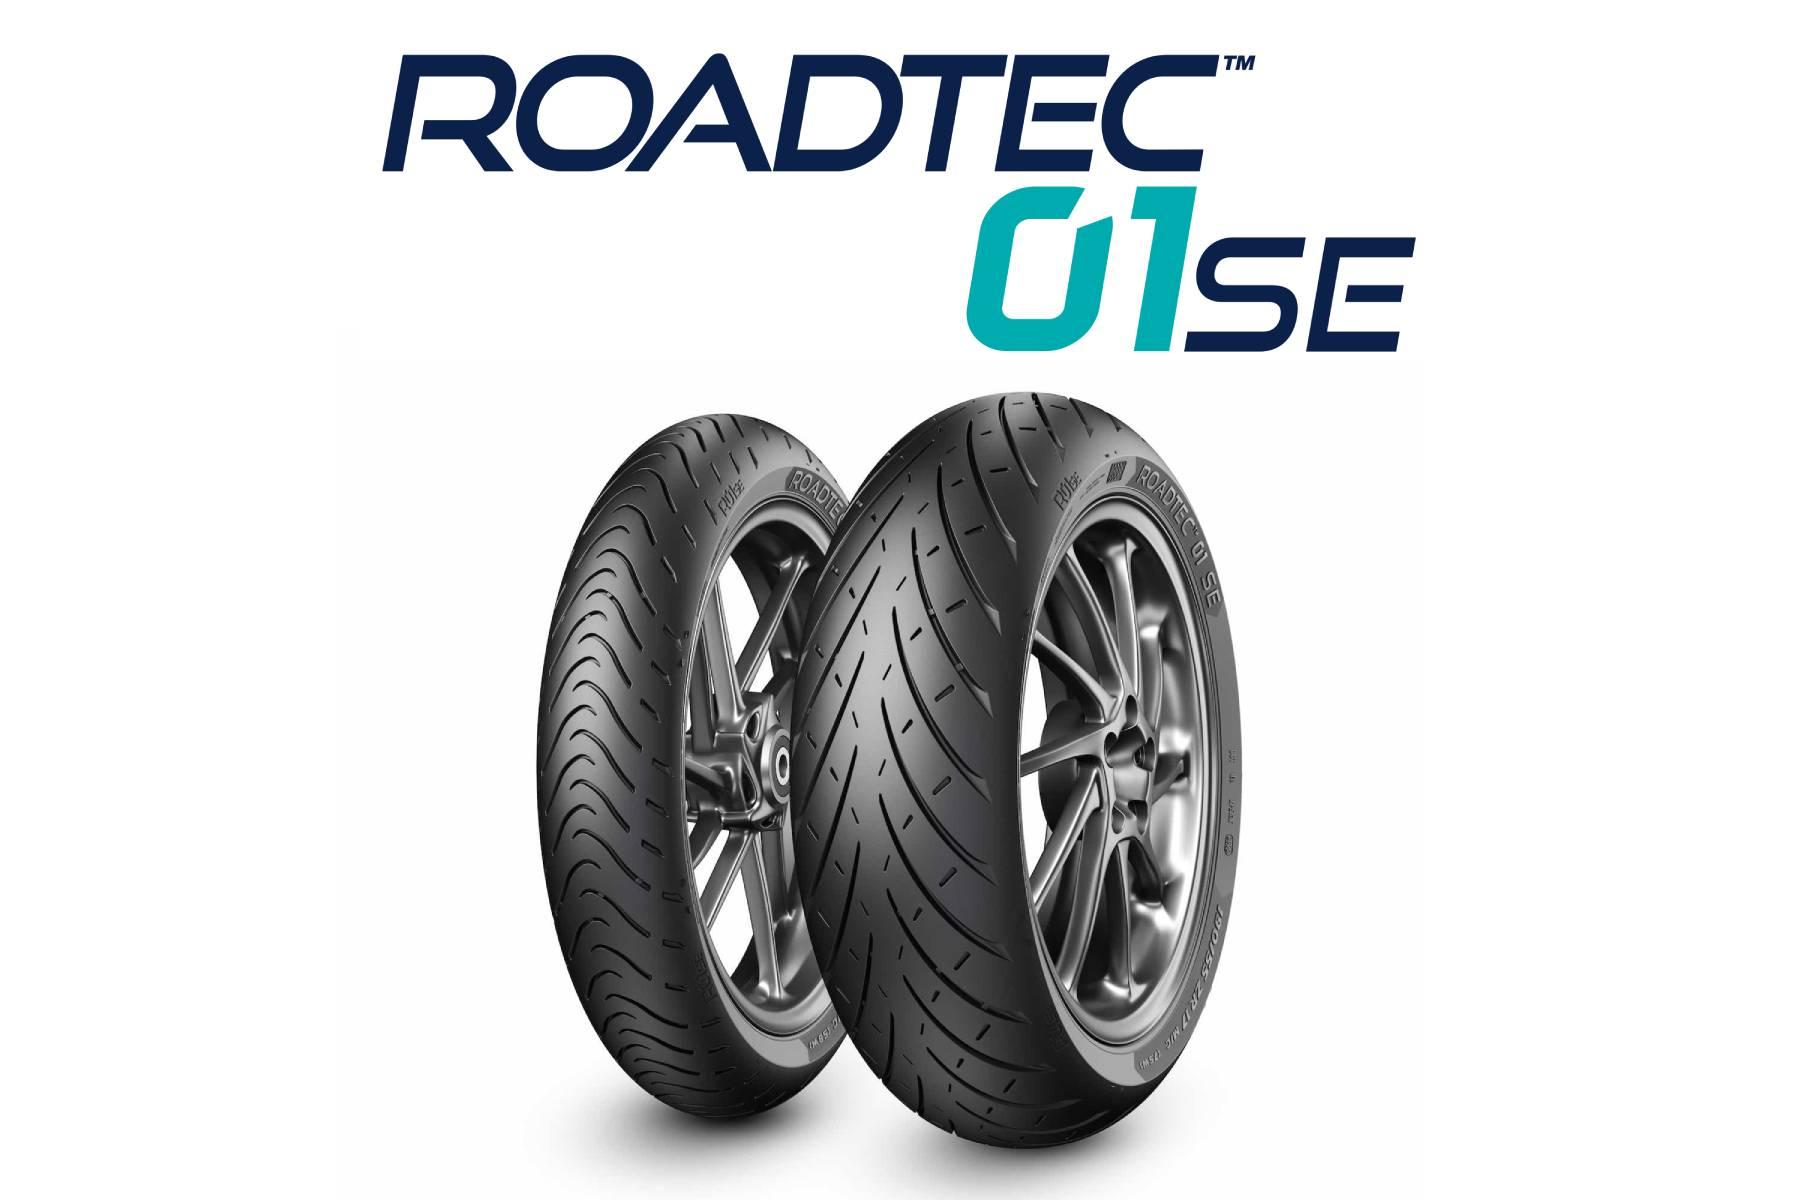 METZELER(メッツラー) ROADTEC™ 01 SEを発表